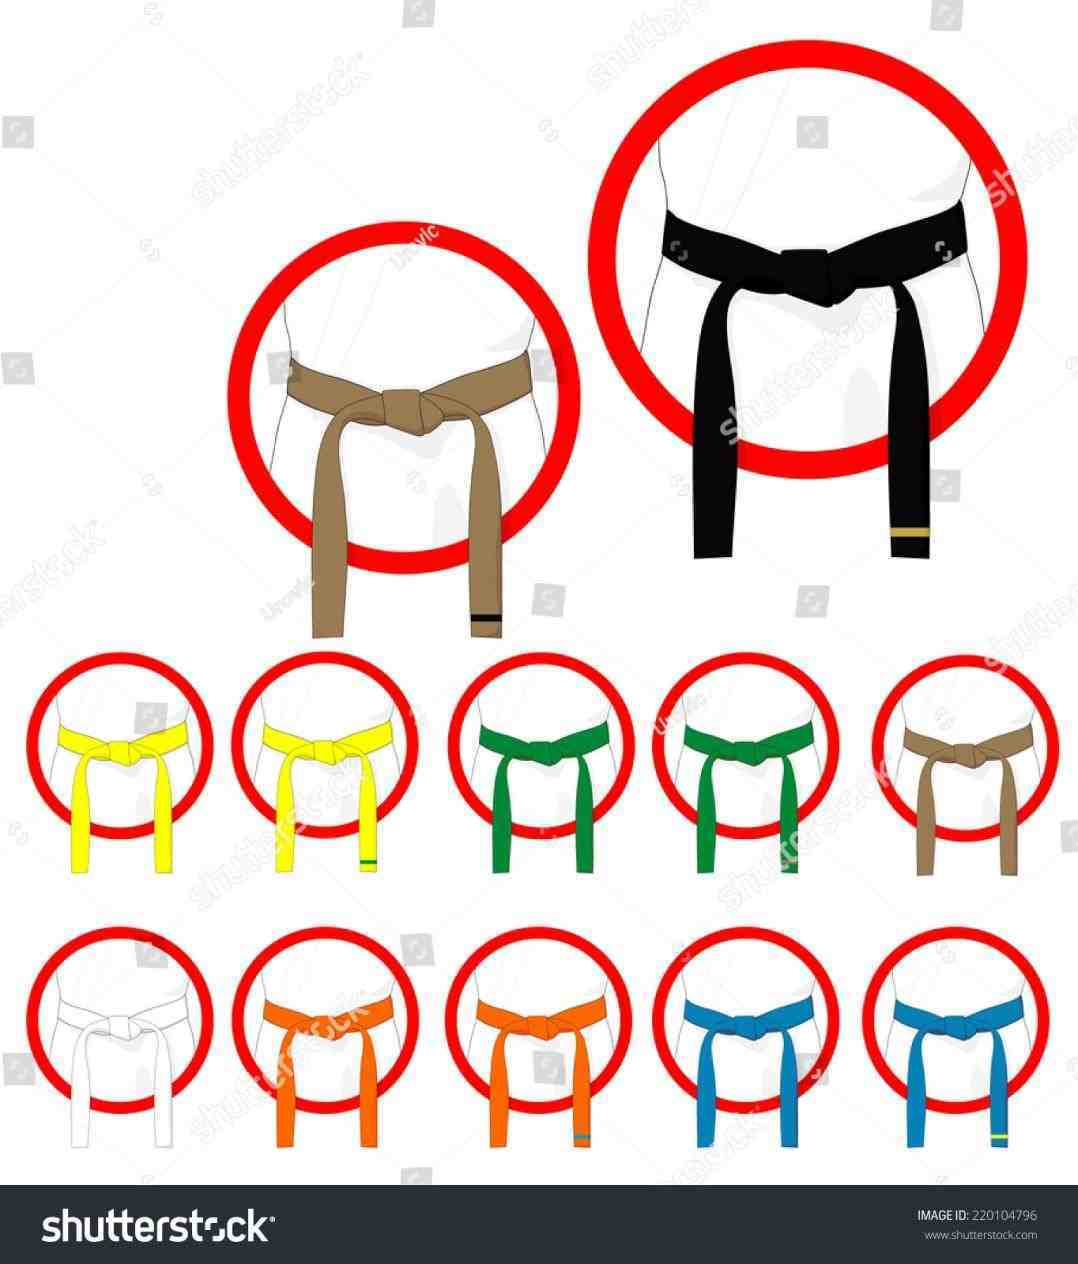 1078x1264 Karate Clip Art Black And White. Free Symmetry Martial Arts